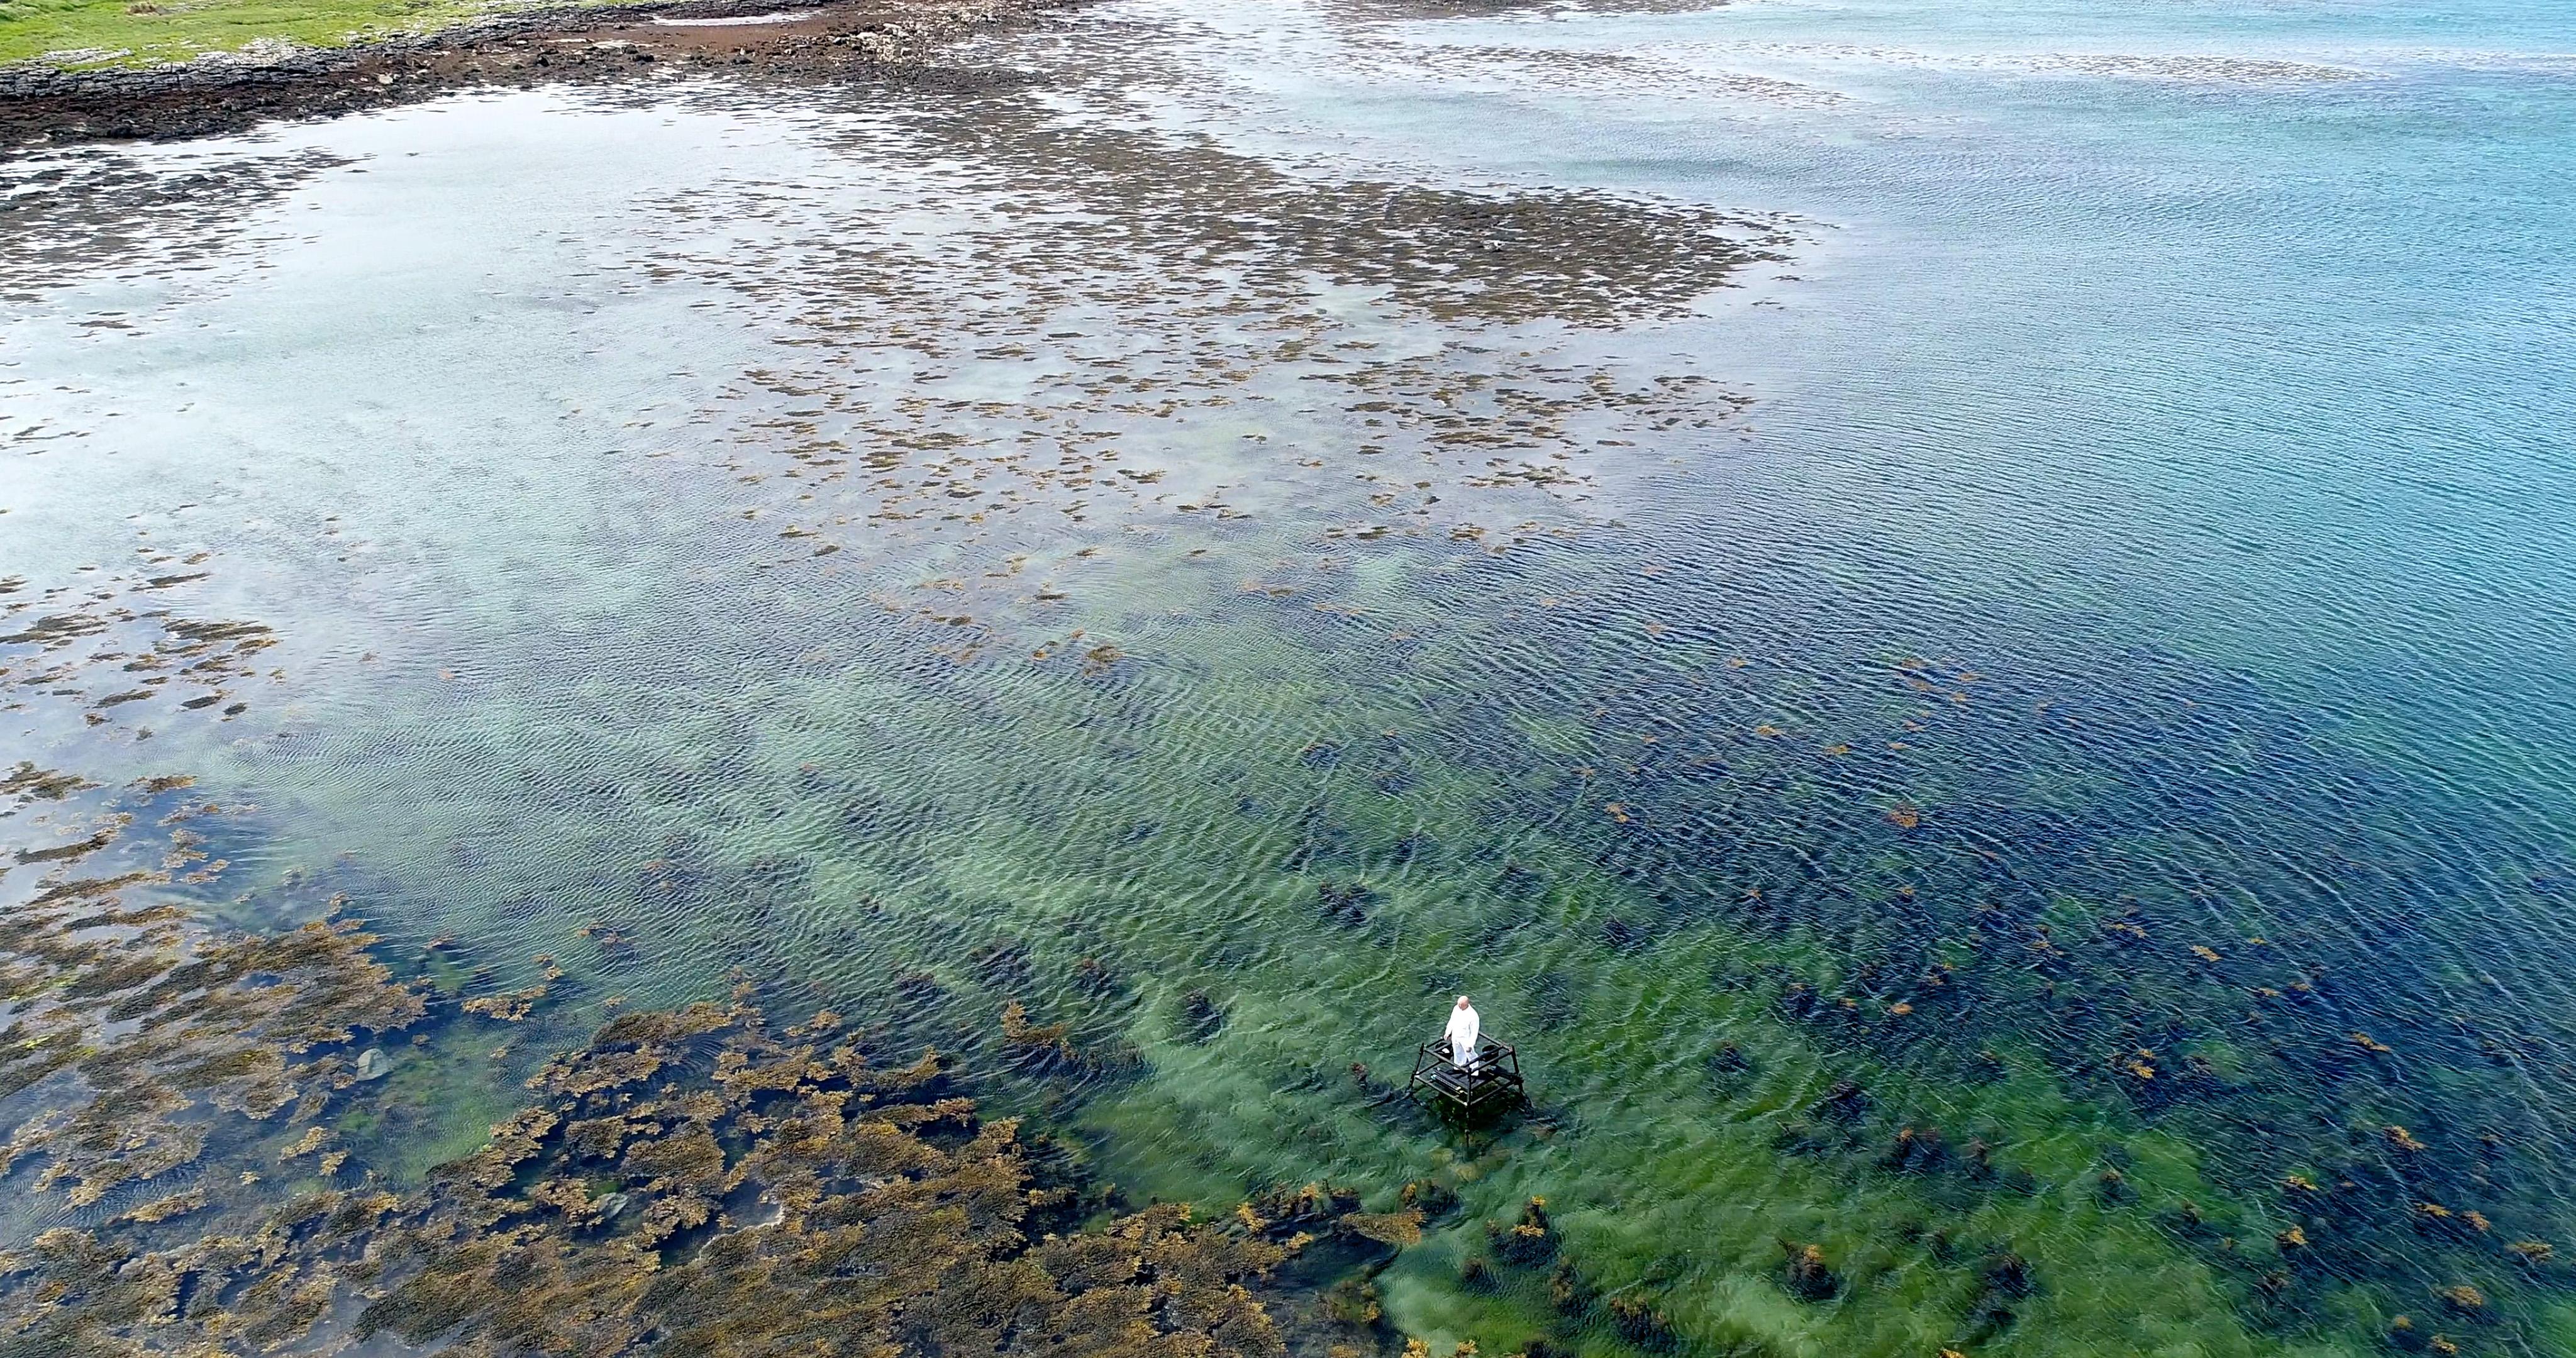 White figure in blue green sea